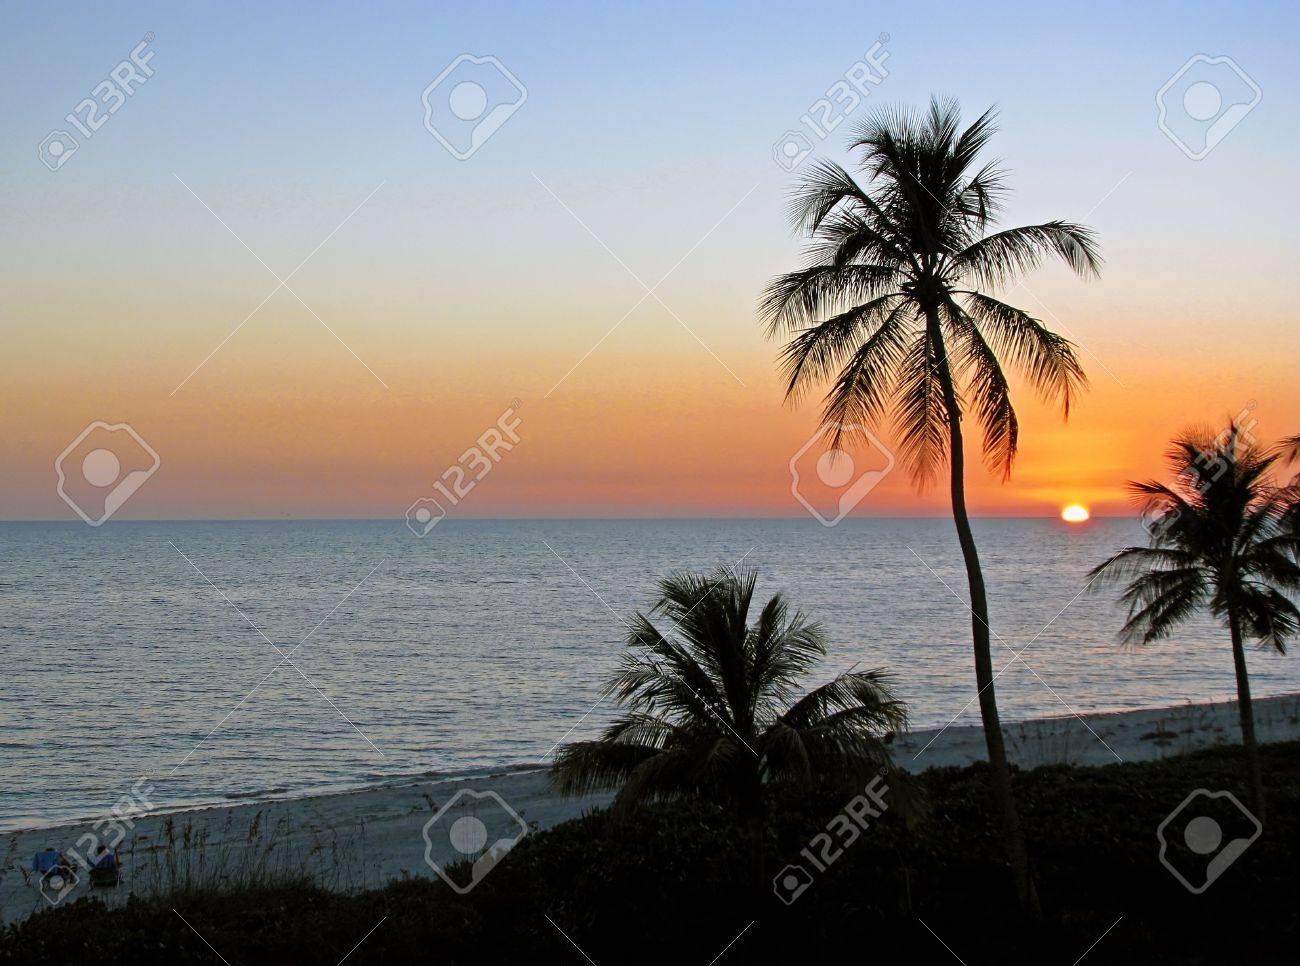 Couple Sitting In Beach Chairs Watching Sunset Stock Photo